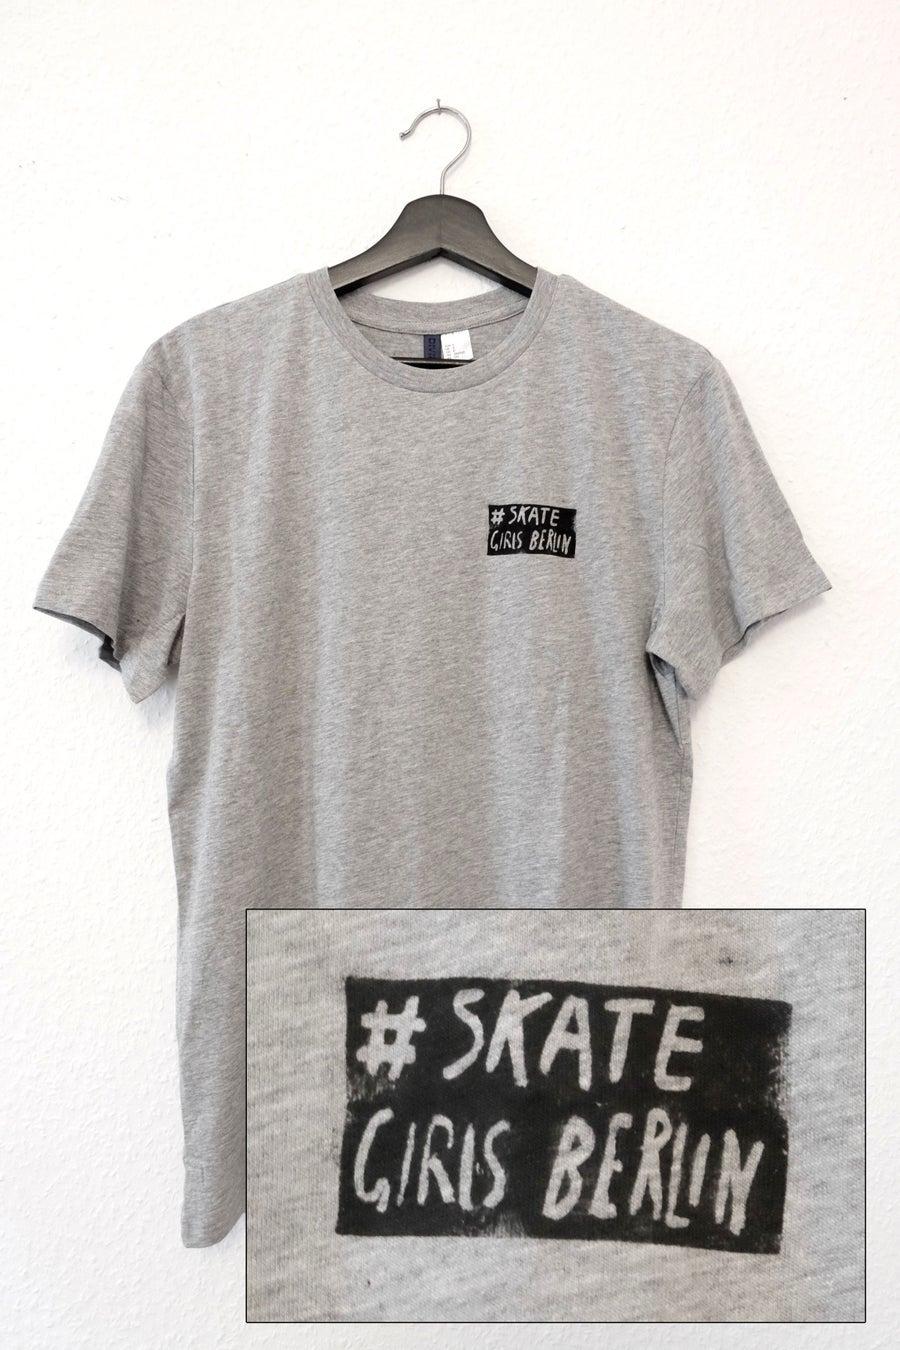 Image of Skate Girls Berlin T-Shirt (grey)